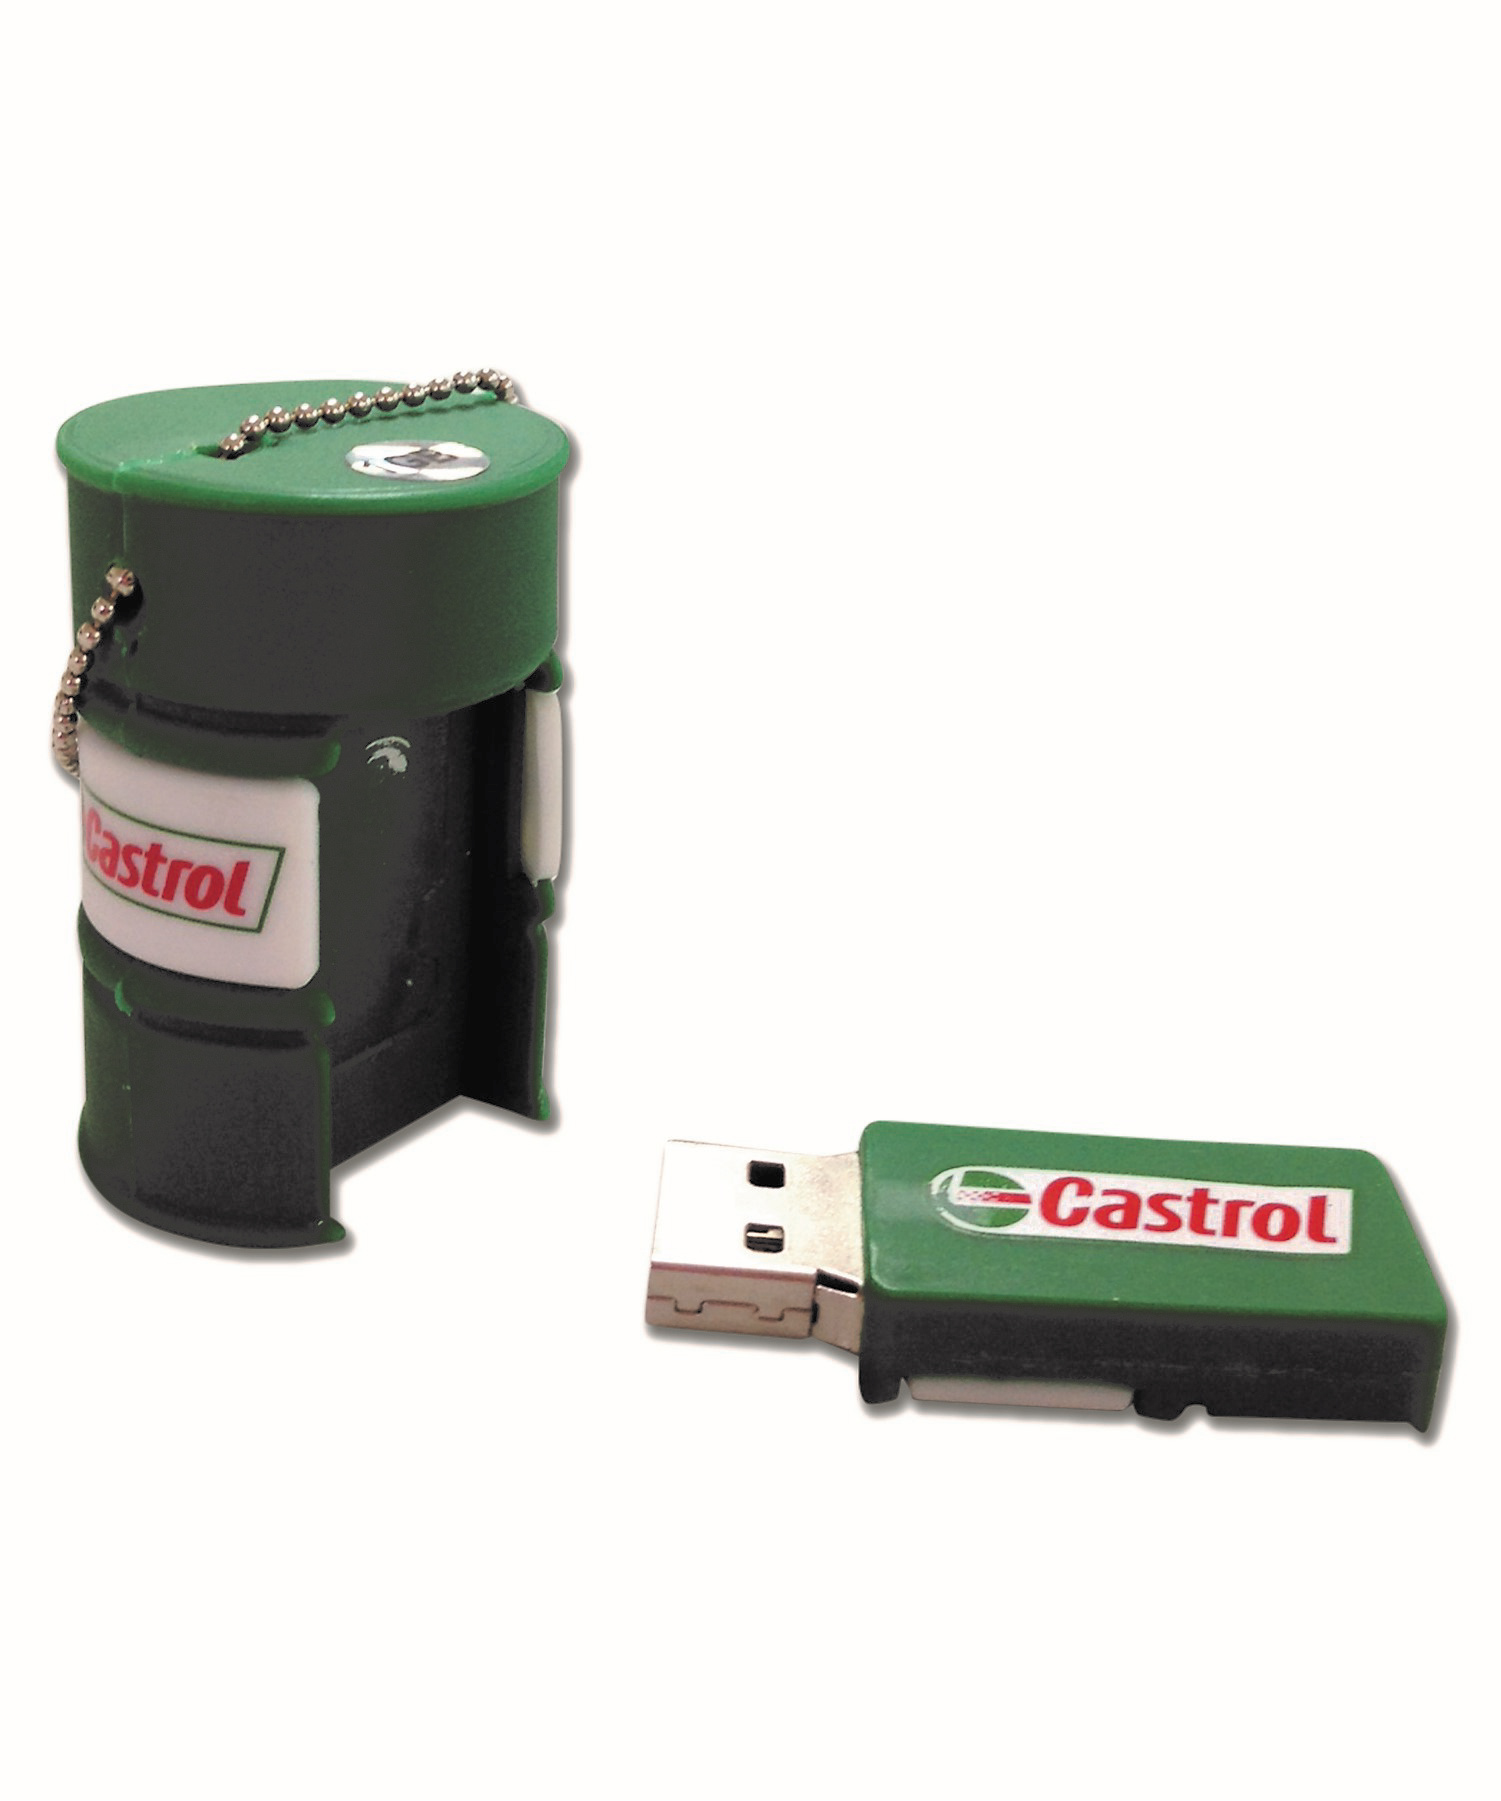 Castrol USB 1